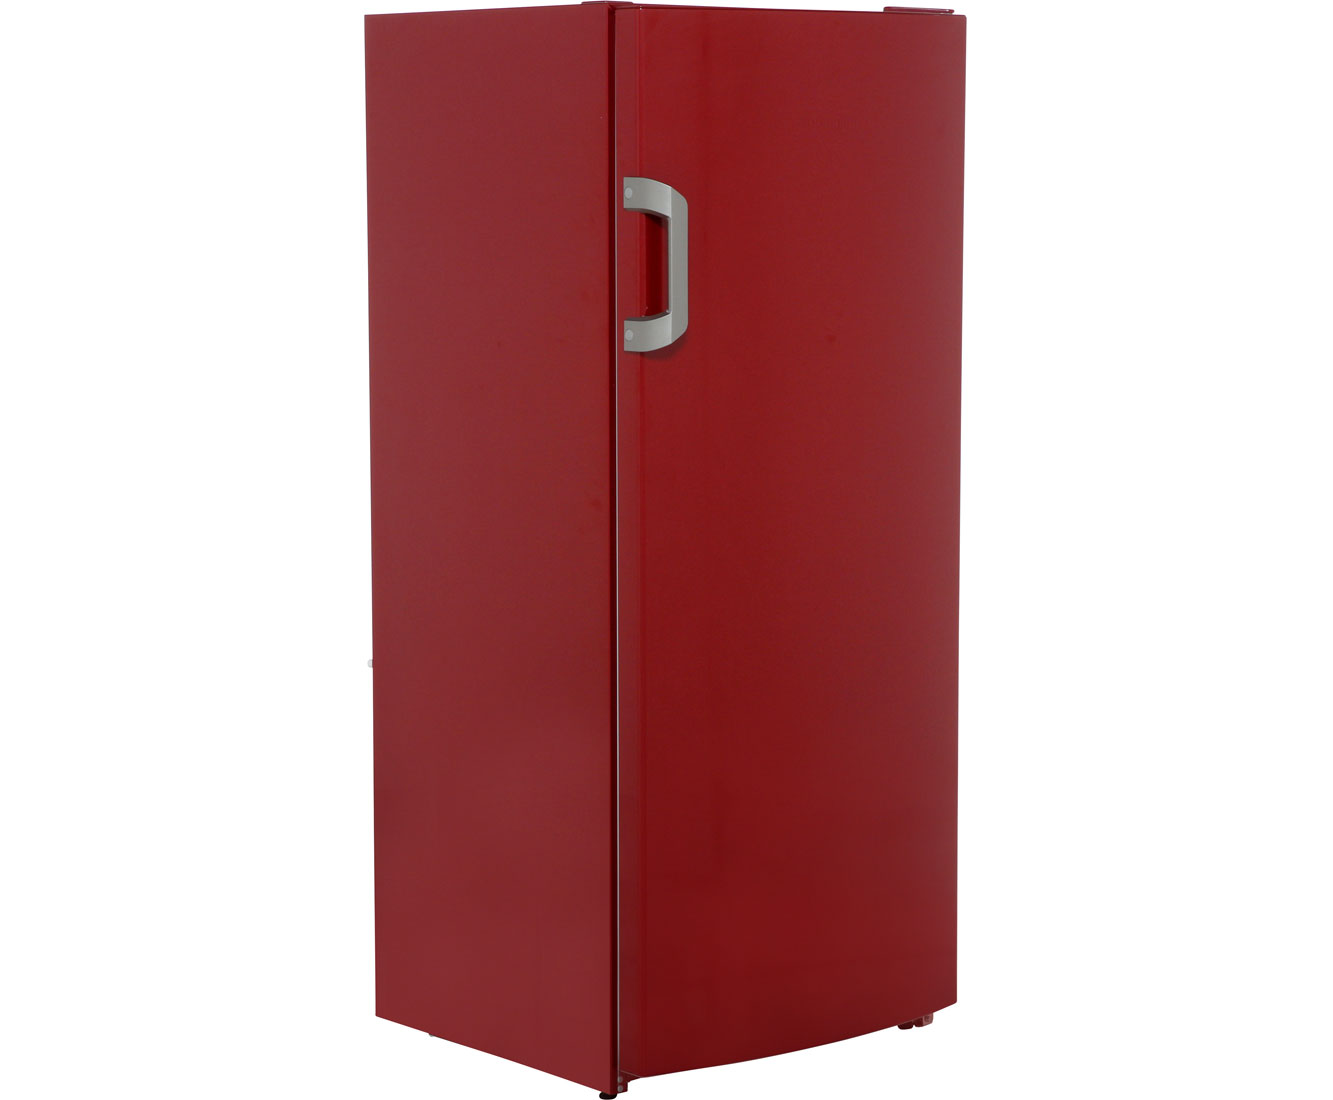 Gorenje Kühlschrank 50 Cm Breit : Gorenje r brd kühlschrank freistehend cm rot neu ebay